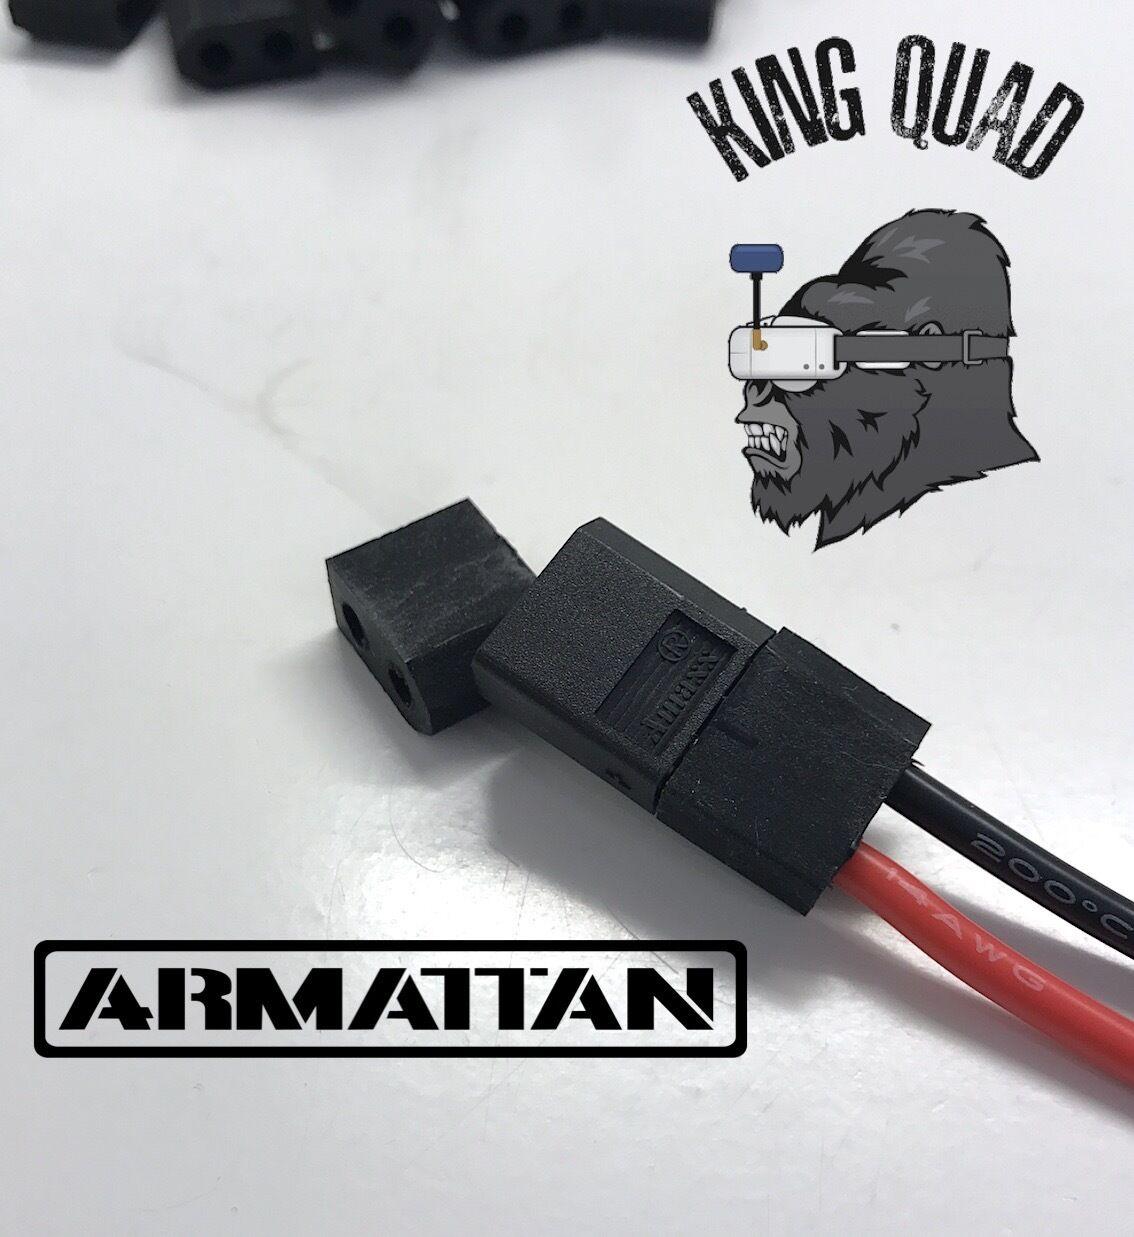 Armattan Lipo Battery Conector Saver (2 Pieces)